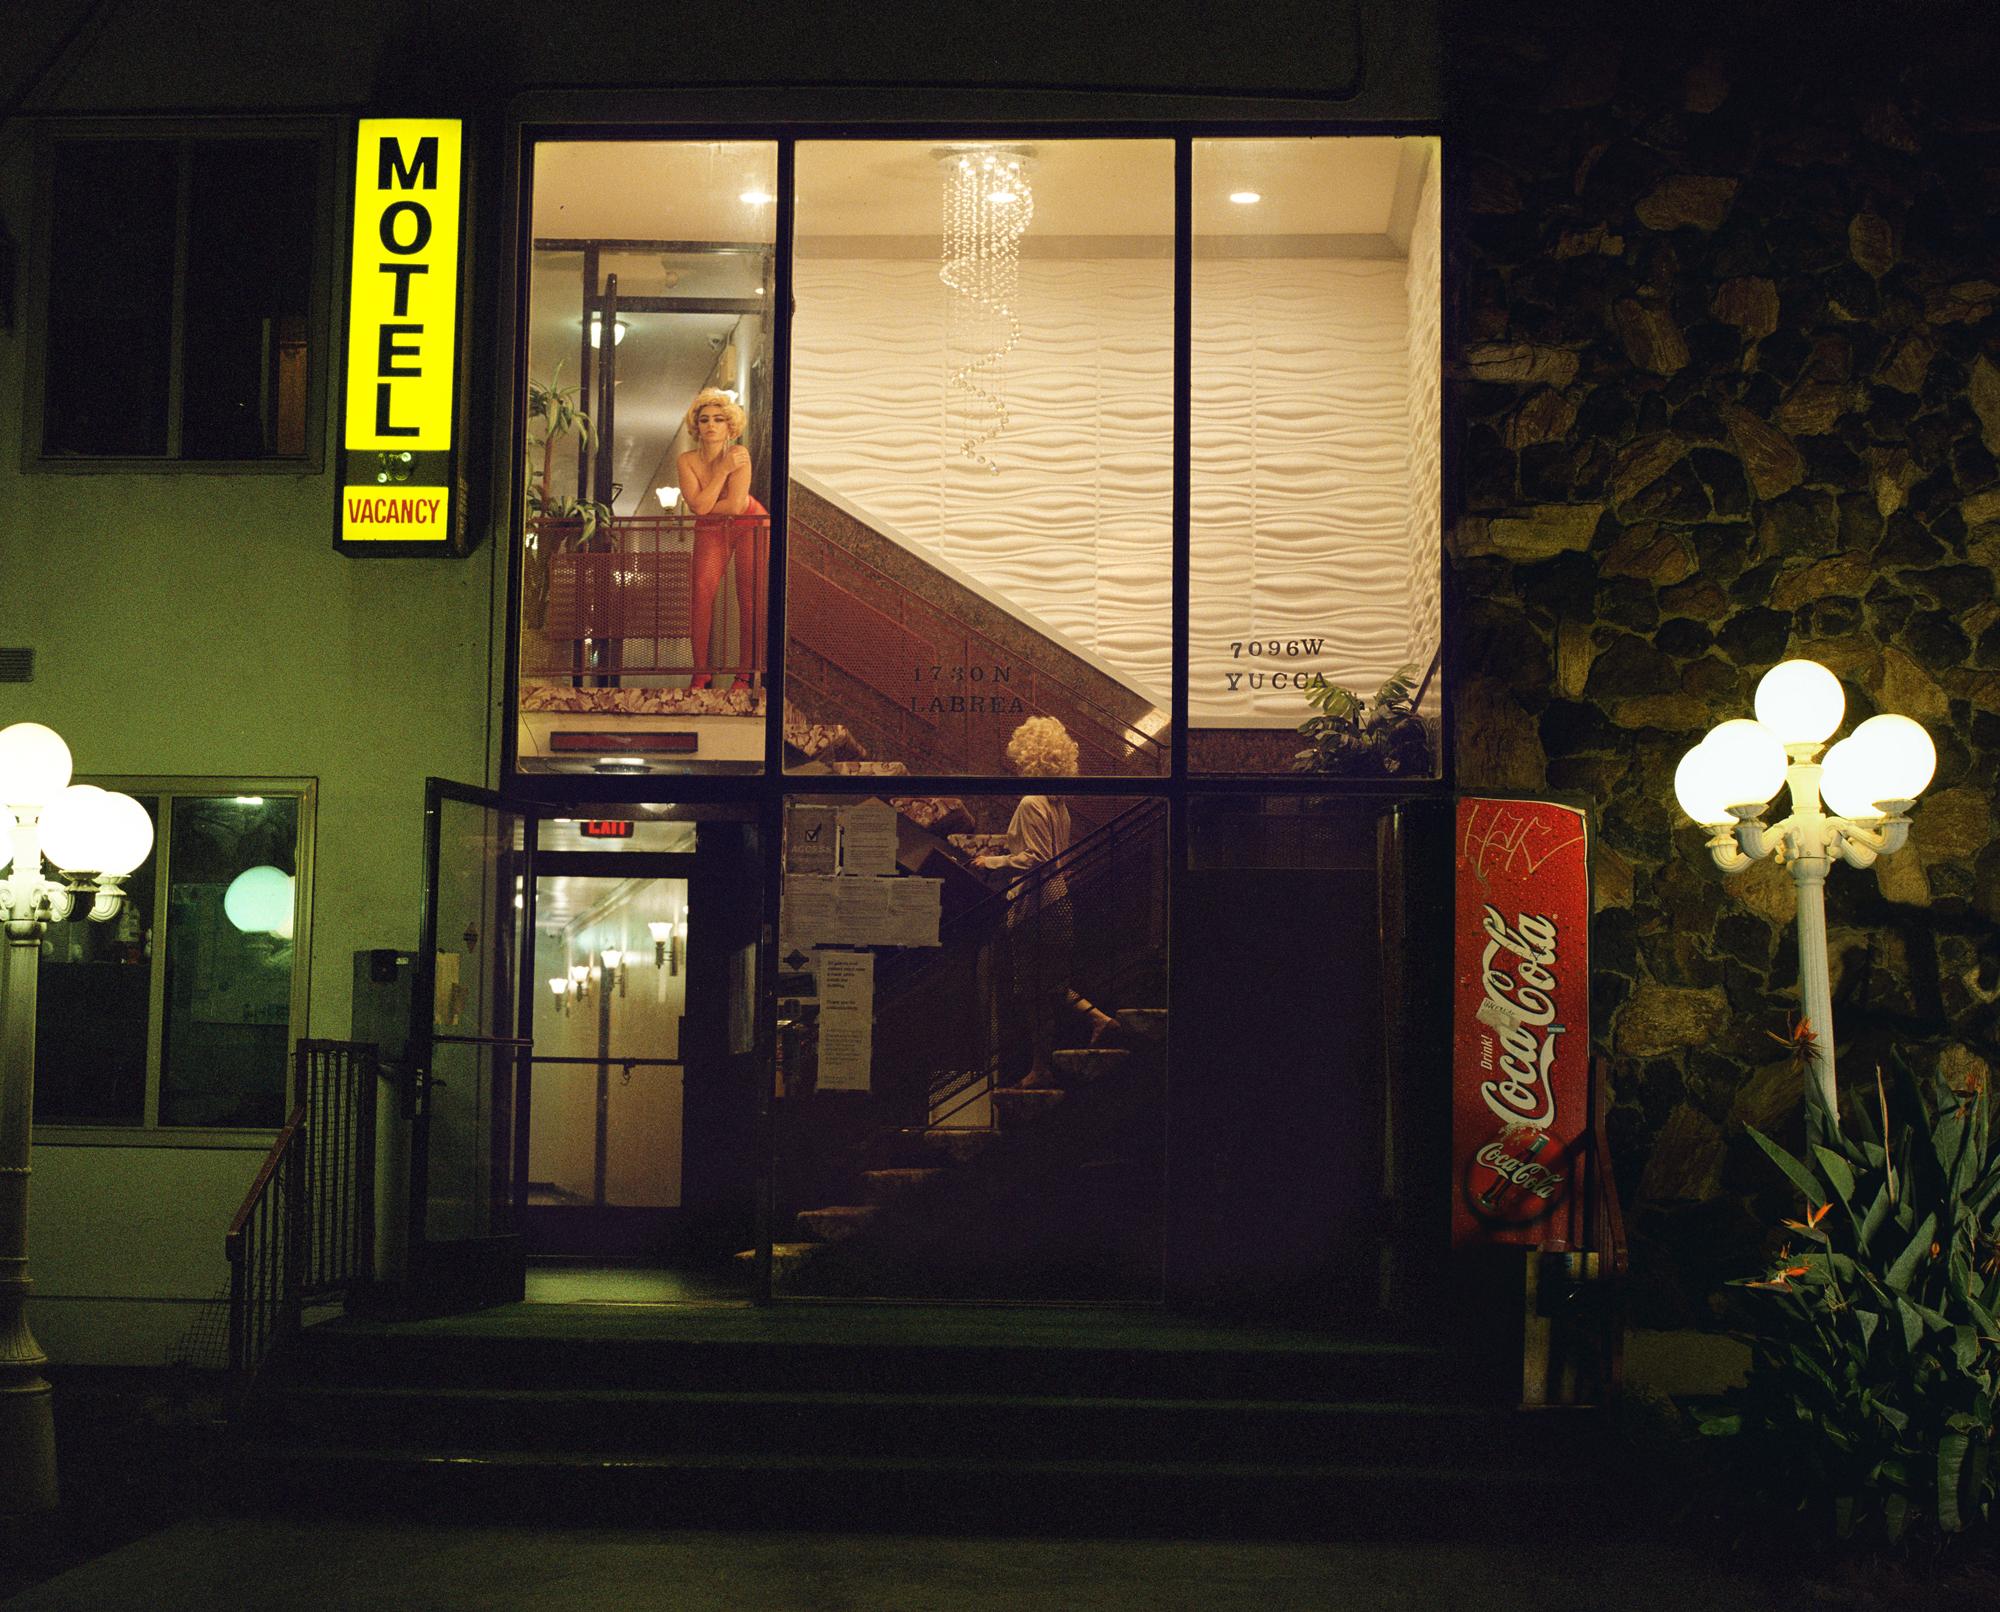 Charli, Hollywood, California (Charli XCX)